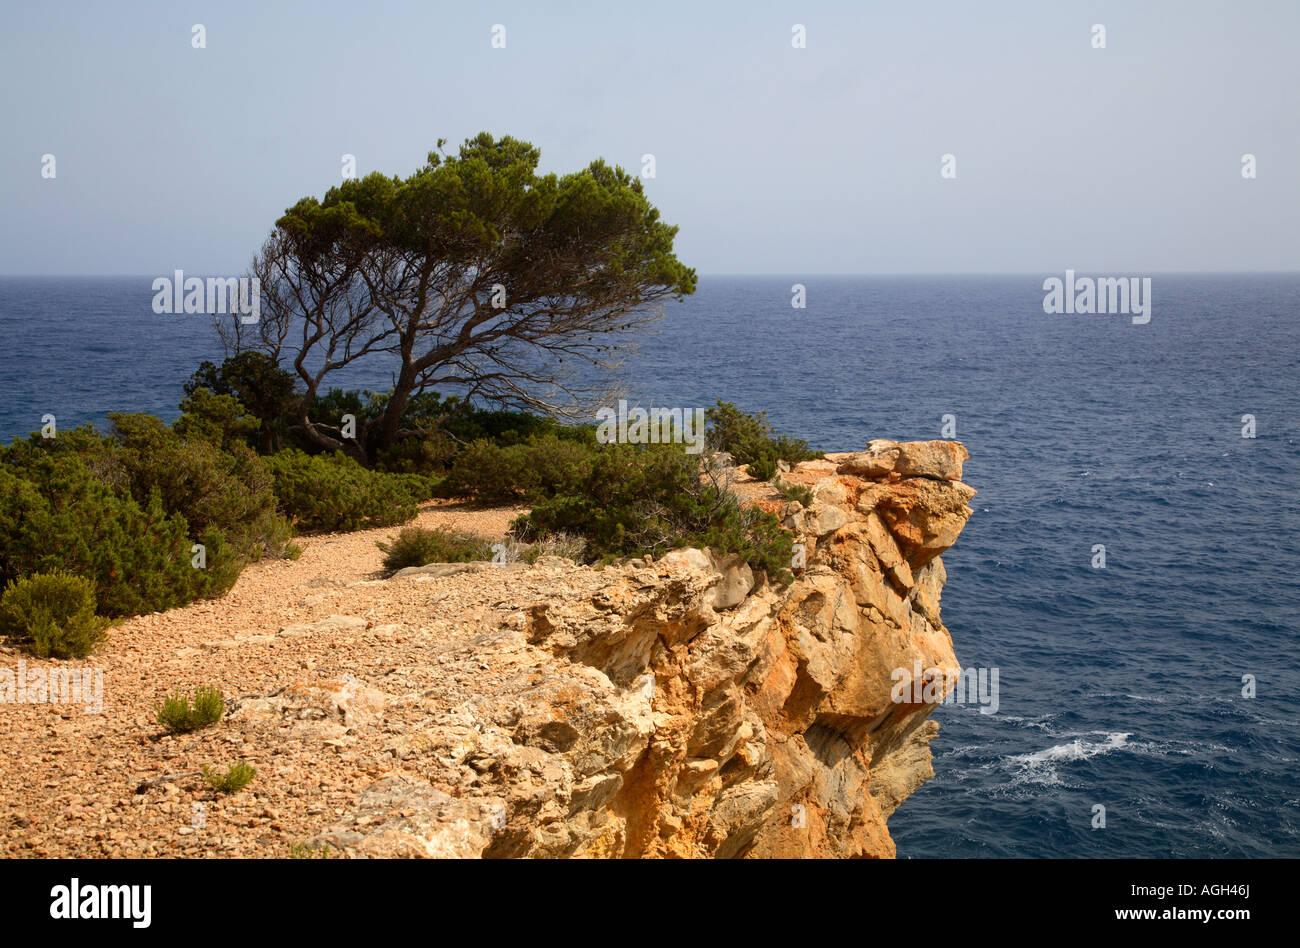 Coast at Can Jordi, Ibiza, Spain - Stock Image